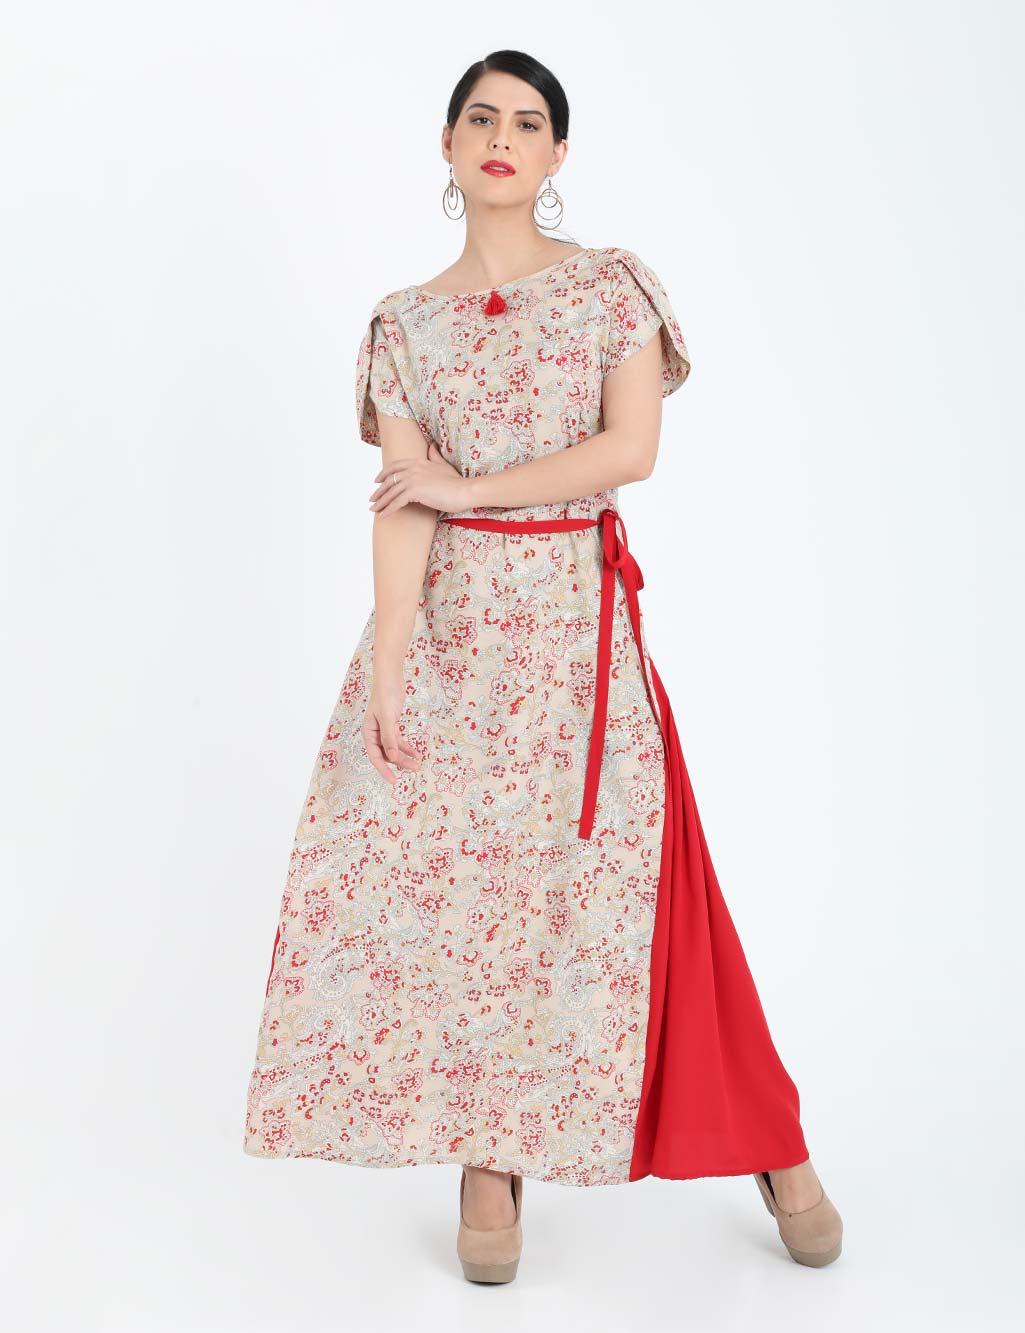 49da3e0293d Pack of 3 Trendy Maxi Dresses - Buy Online at Best Prices | Ezmall.com